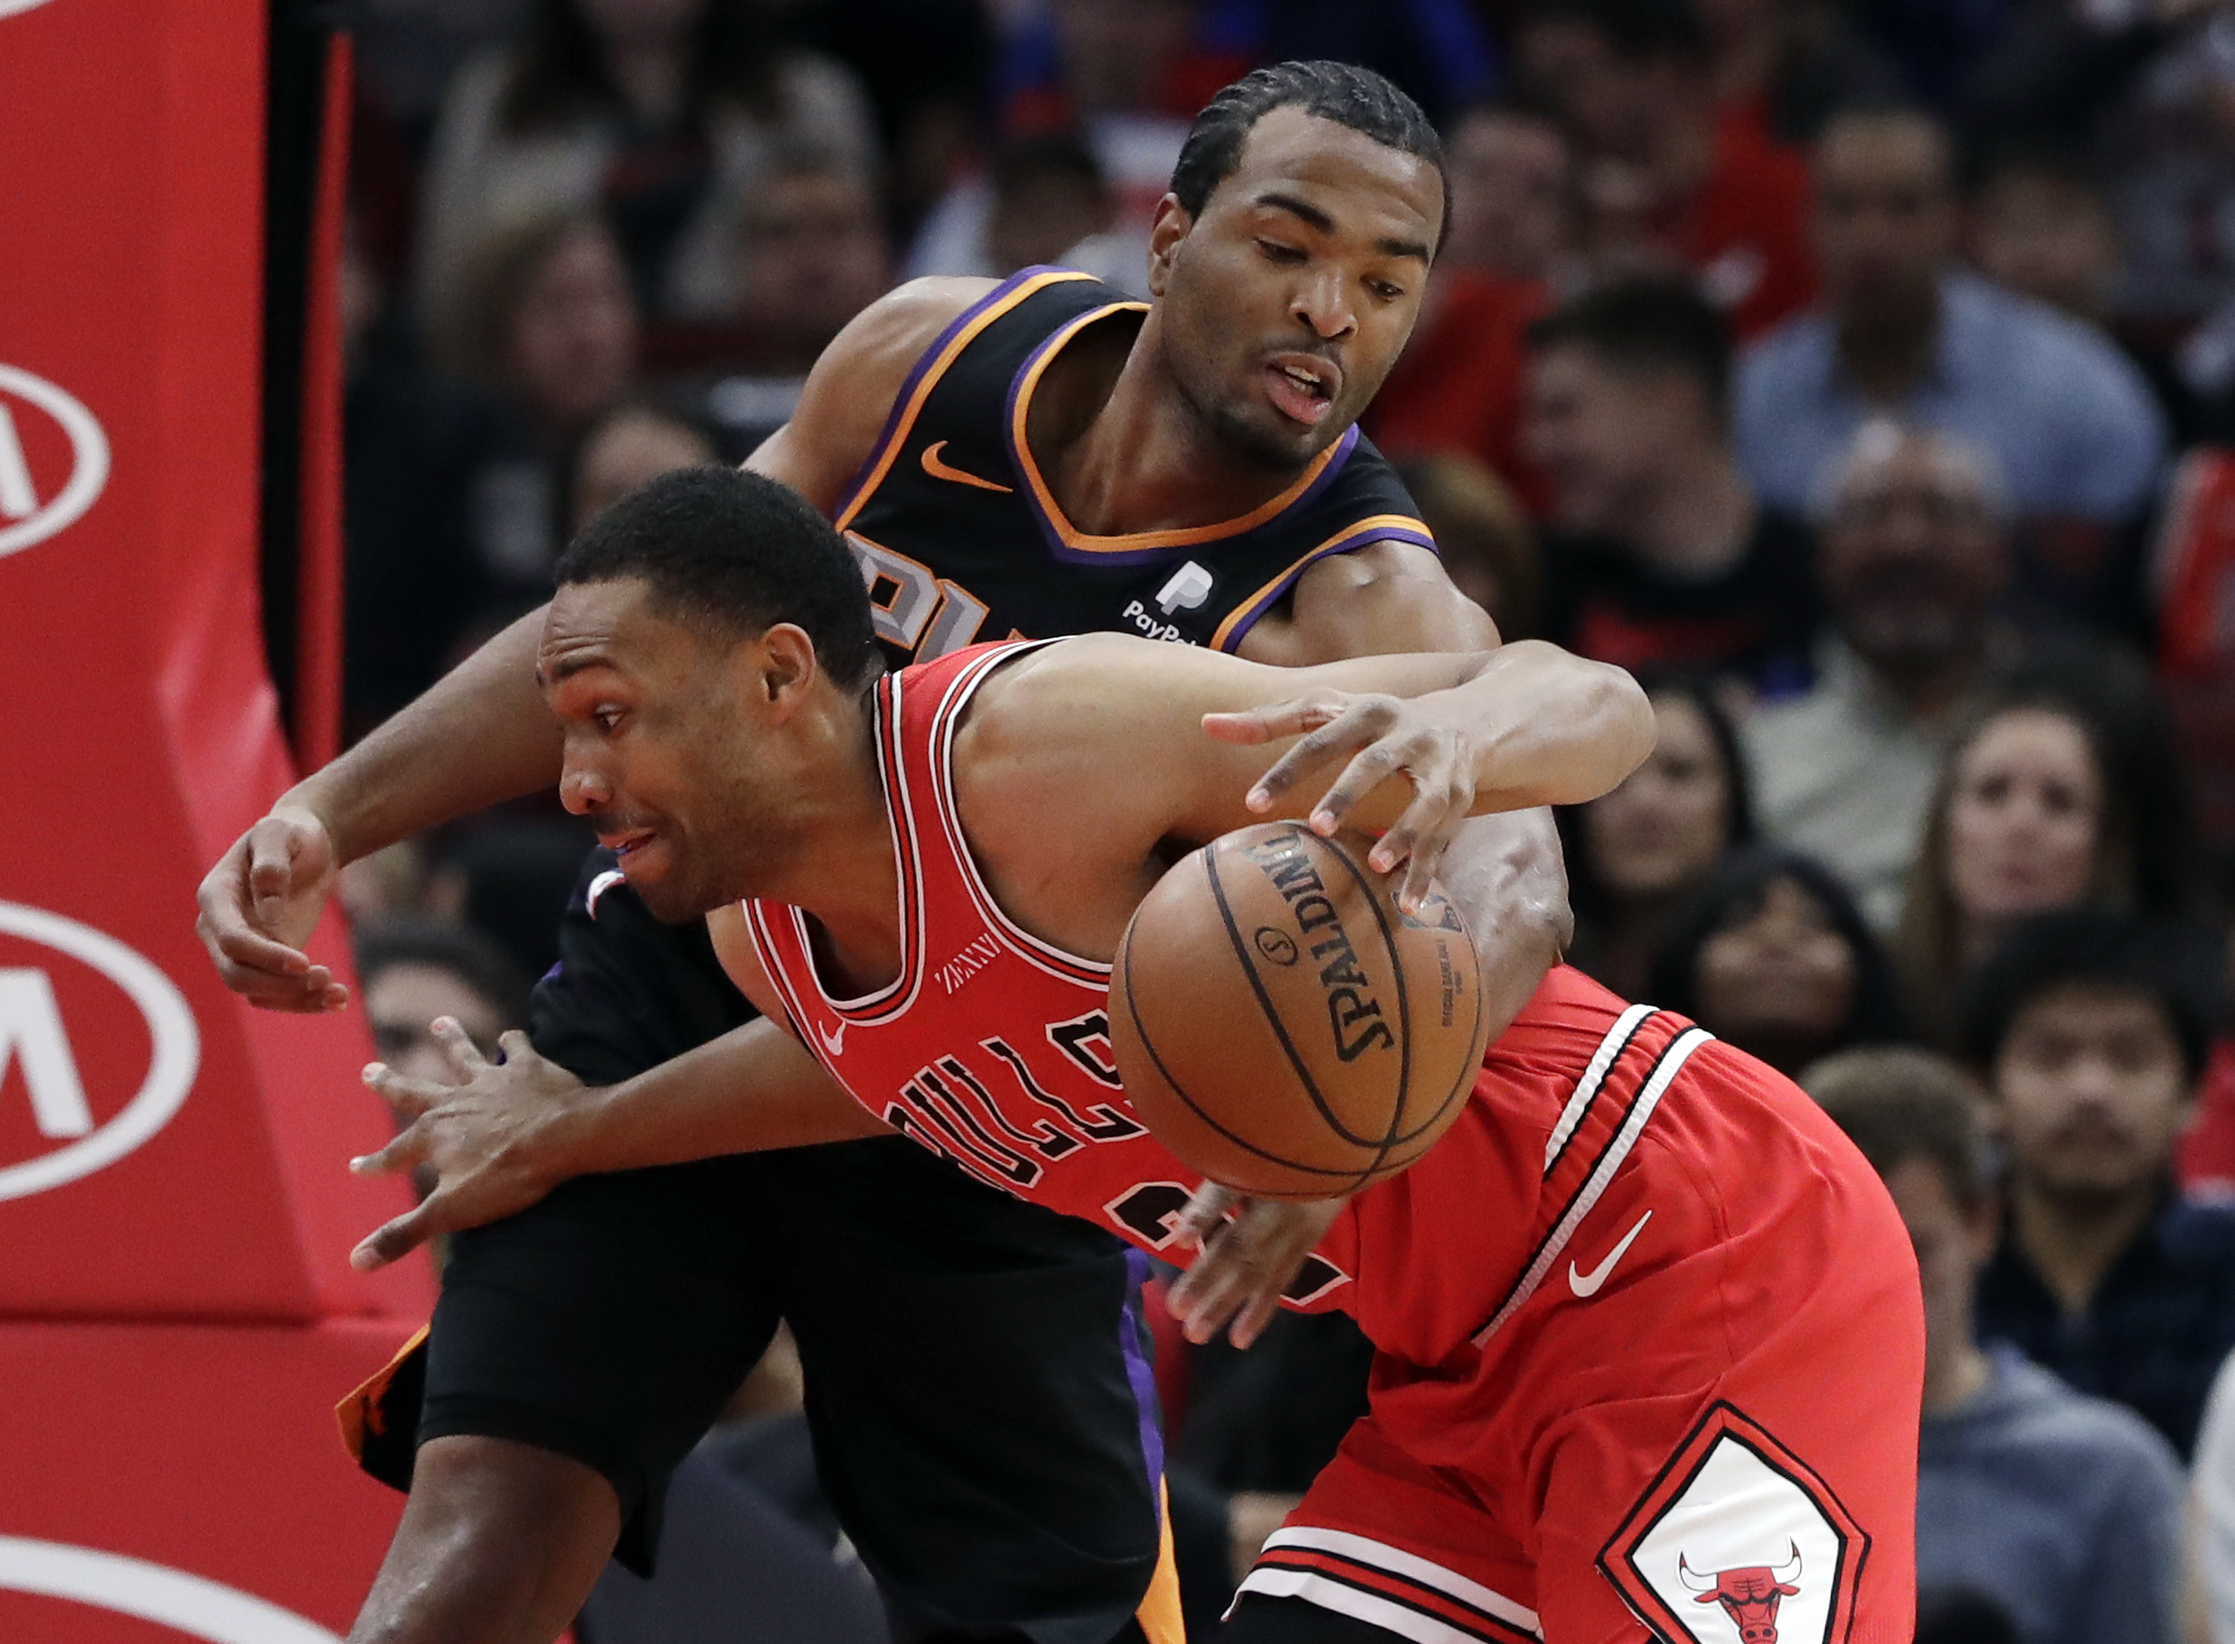 Parker shines as Bulls beat Suns 124-116